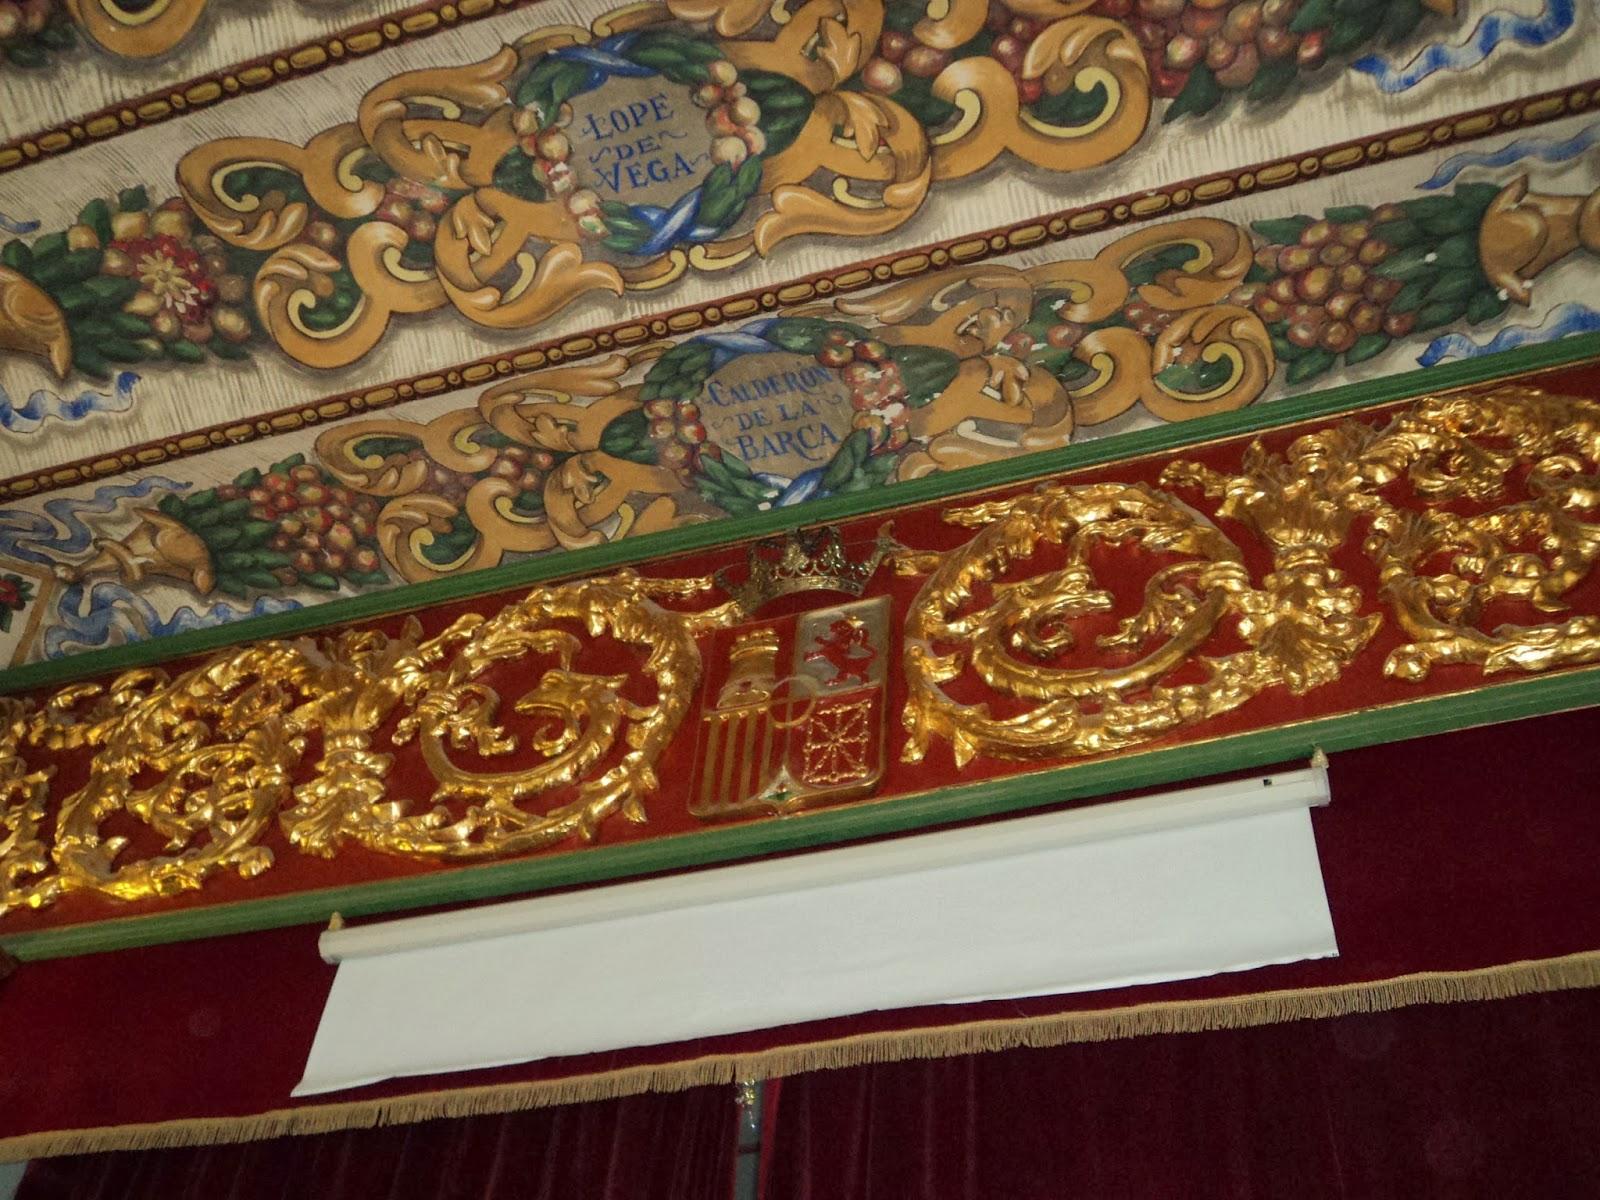 Arte Y Cultura Sevilla Motivos: Cultura De Sevilla: Sevilla Oculta: Teatro Del Grupo